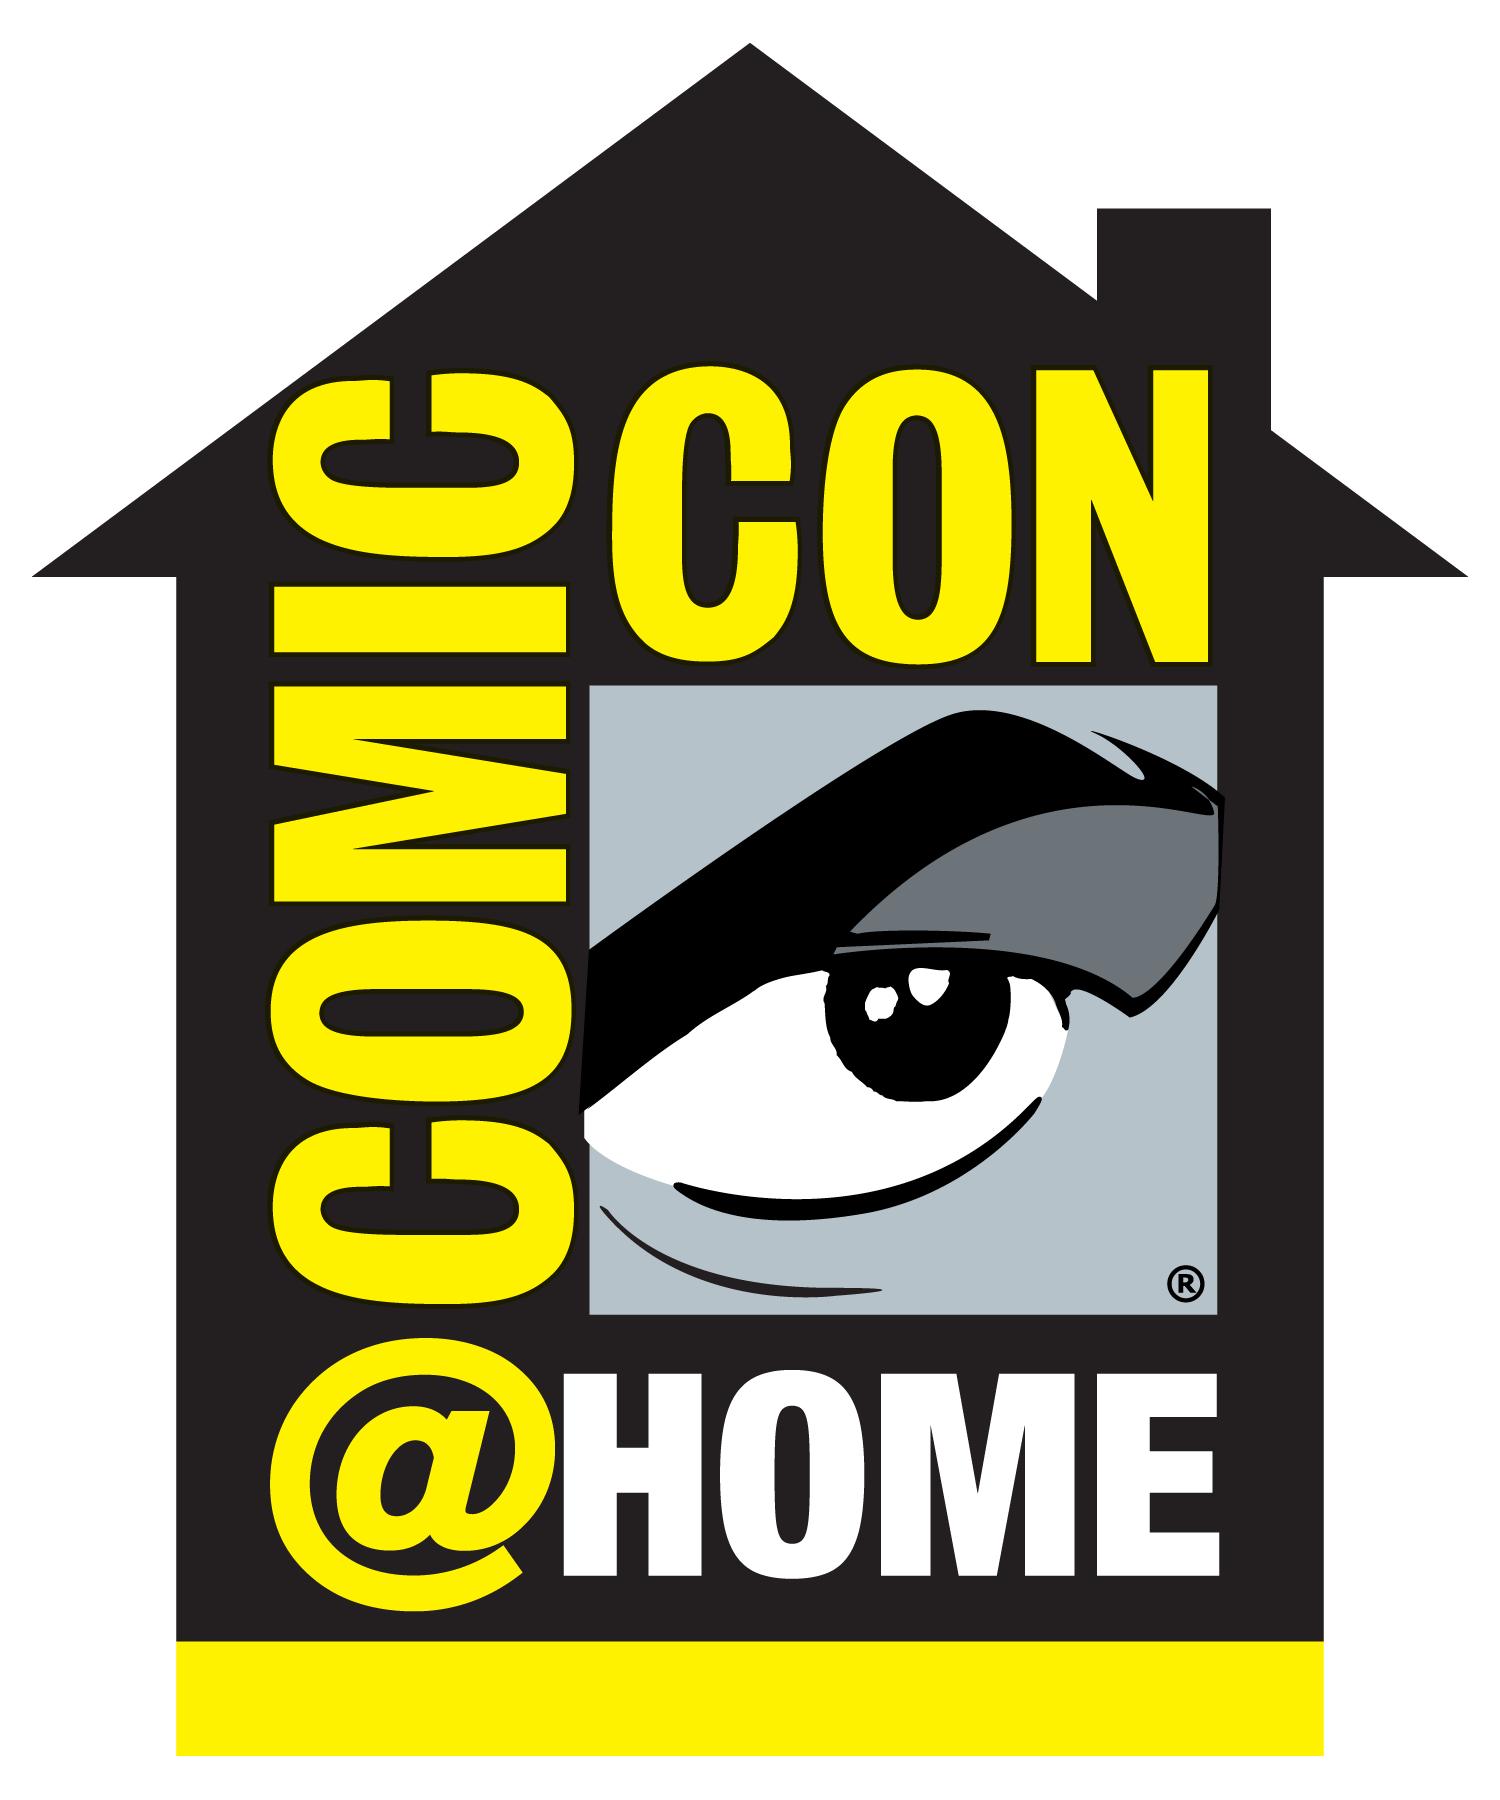 Comic-Con@Home標誌。圖自聖地牙哥動漫展官網